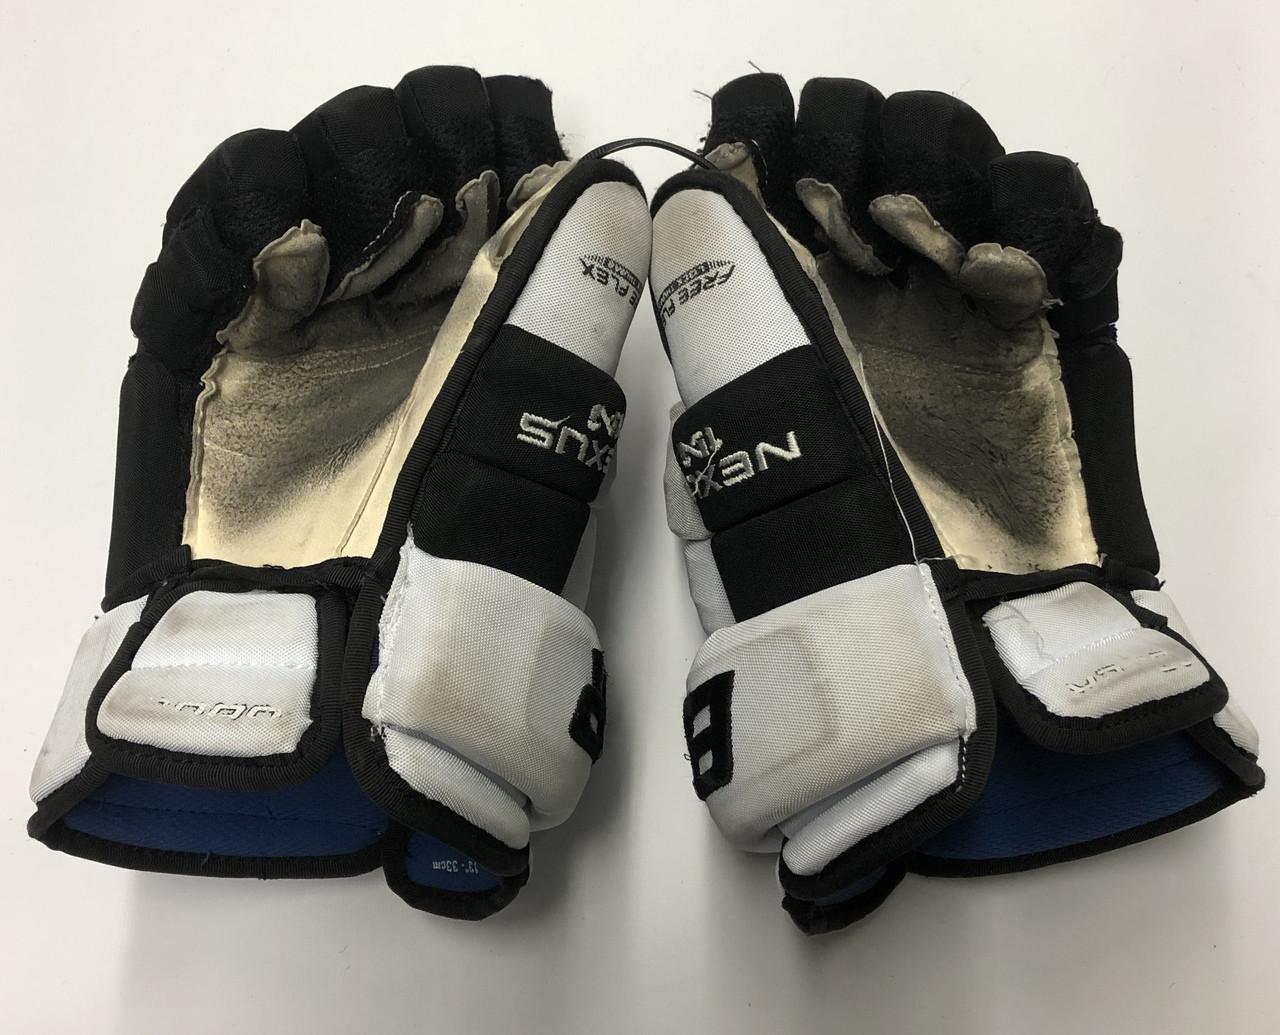 "15ea53a1d7d Gloves 20853  Pro Stock Bauer Apx2 Hockey Gloves Winnipeg Jets Perrault 14"" Blue  Palms. Categories. Home · Pro Stock"